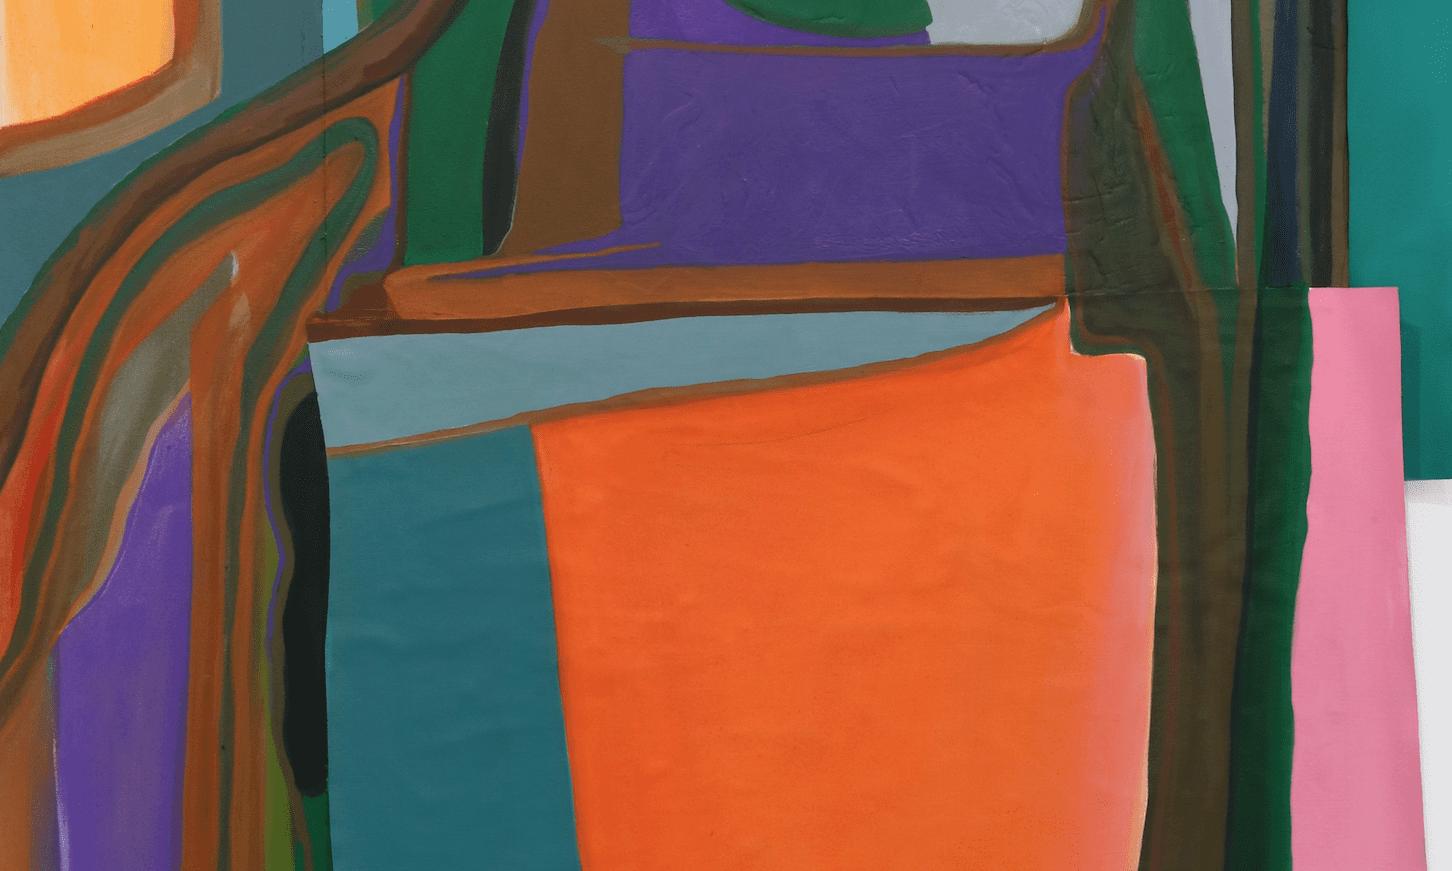 Annabeth Marks. Night Adaptor, 2017. Látex y pintura al óleo sobre lienzo.